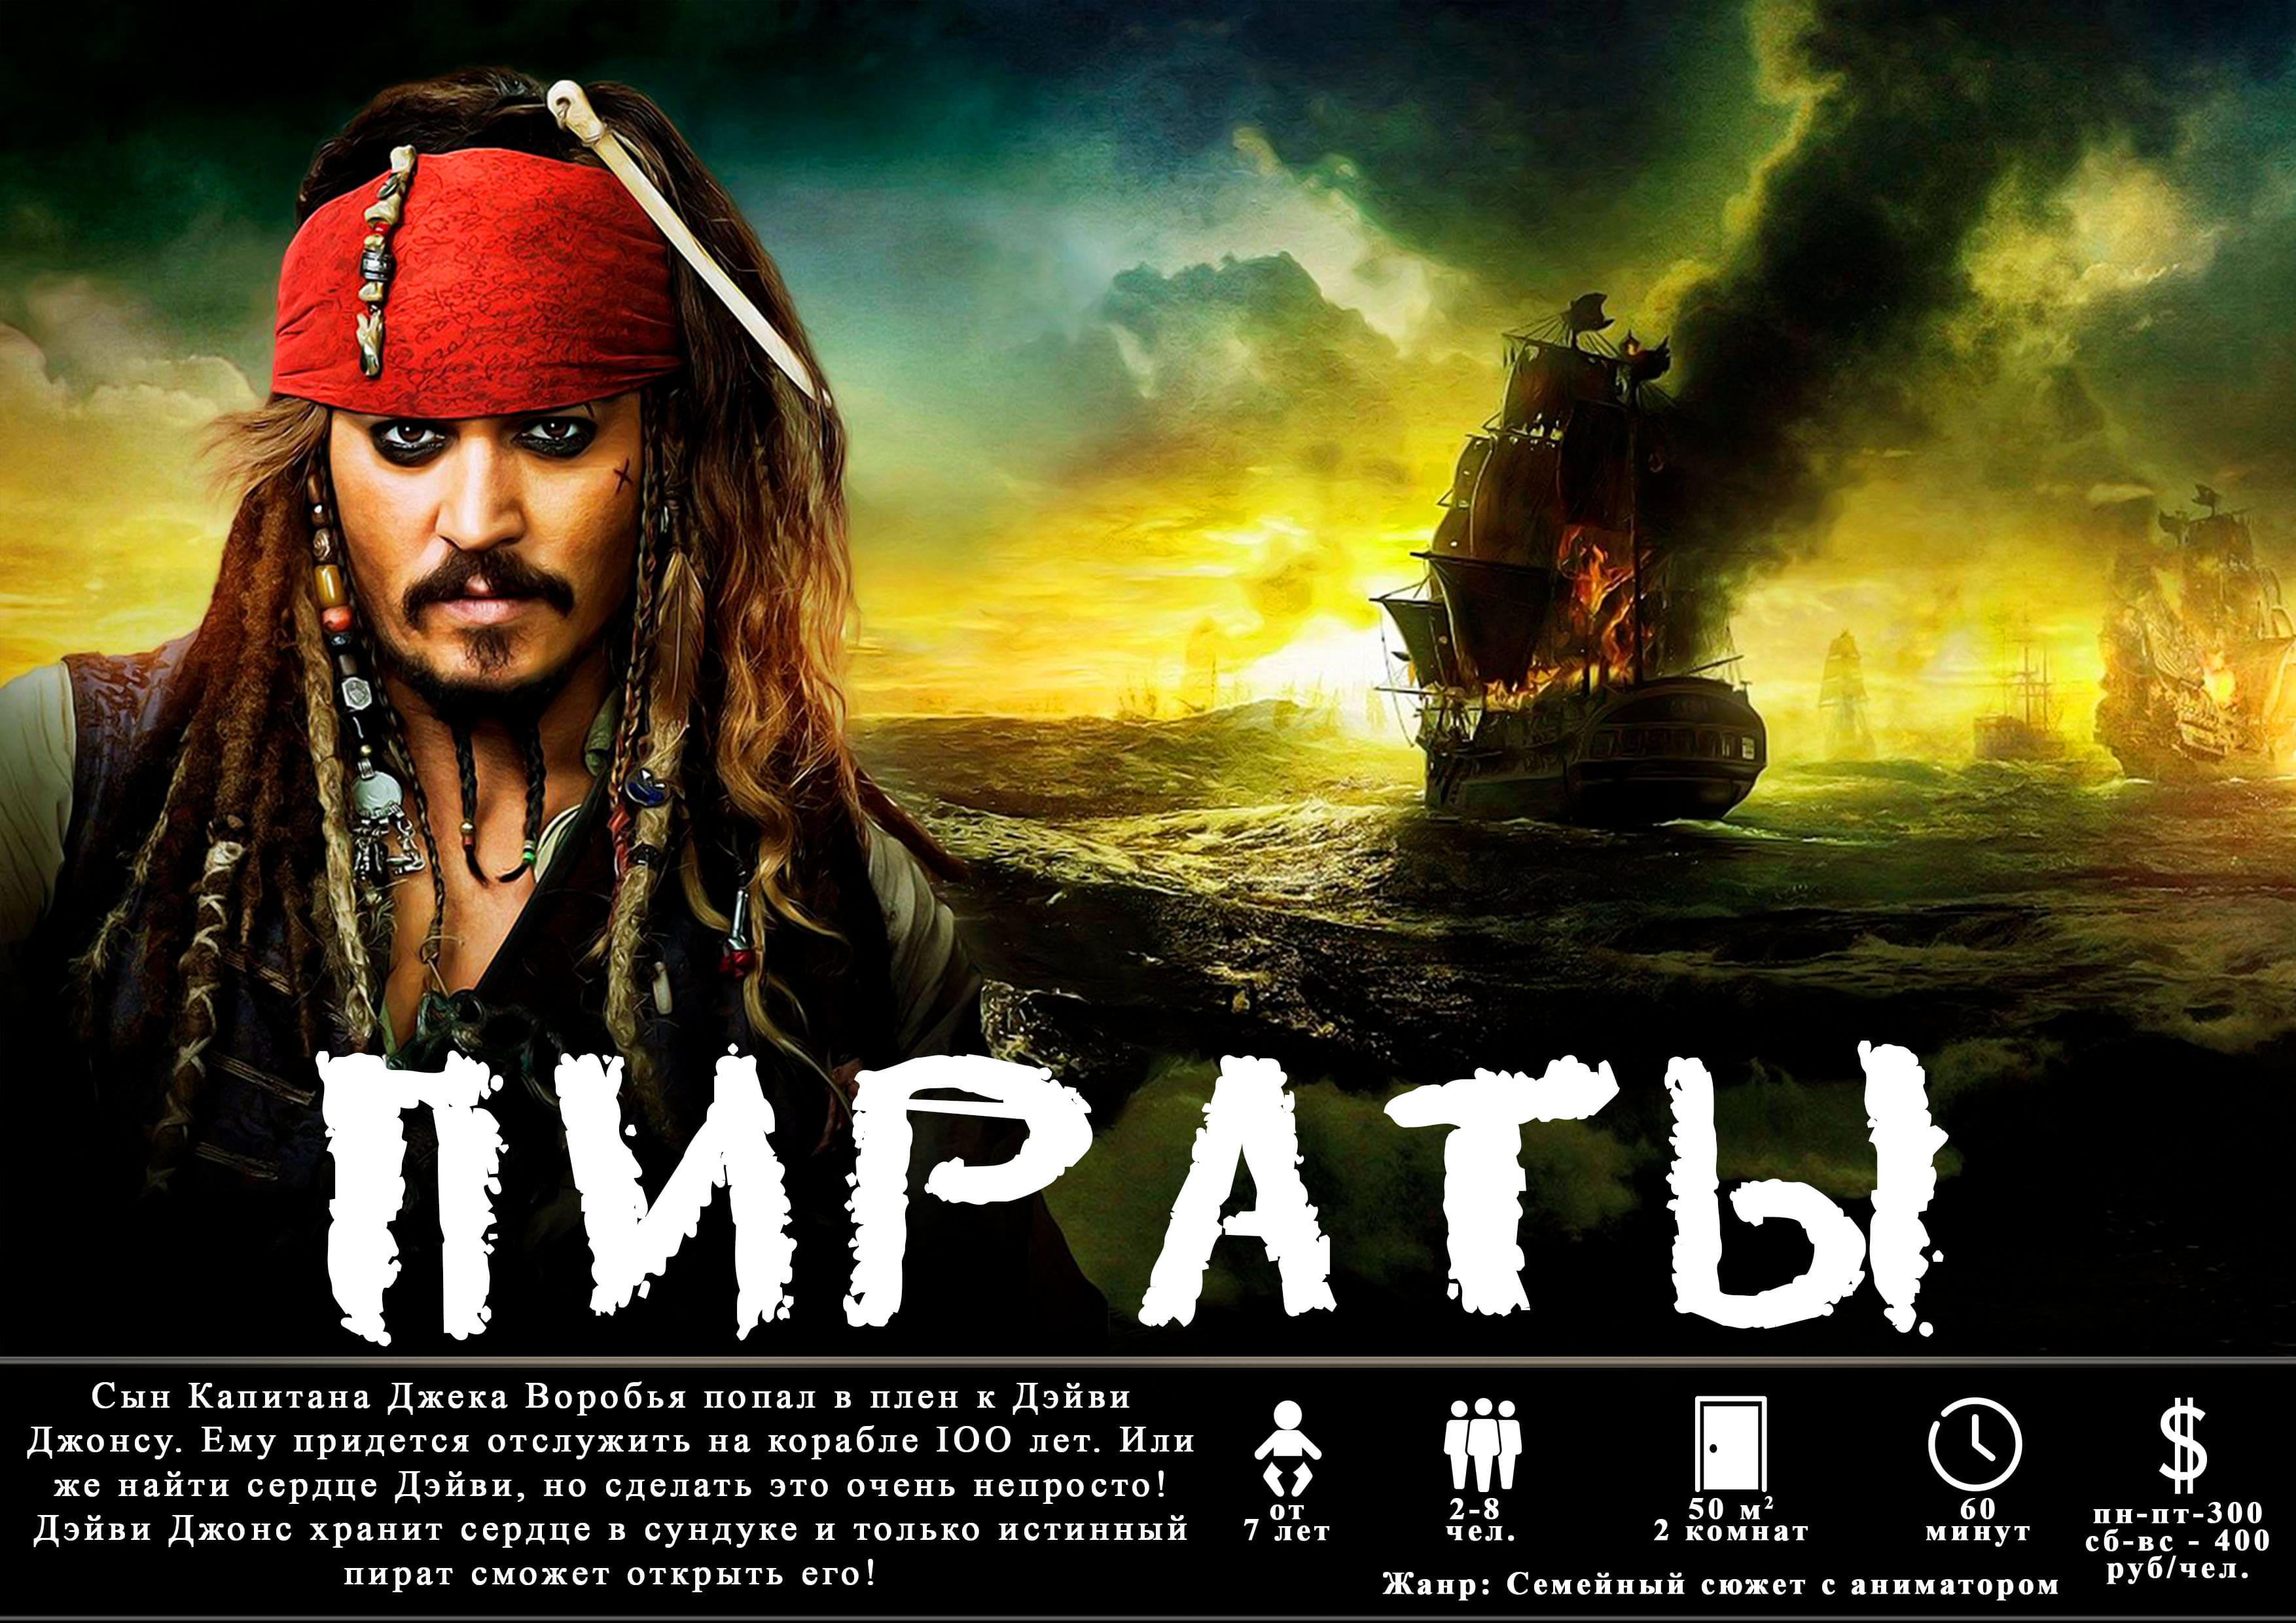 7. Пираты-min